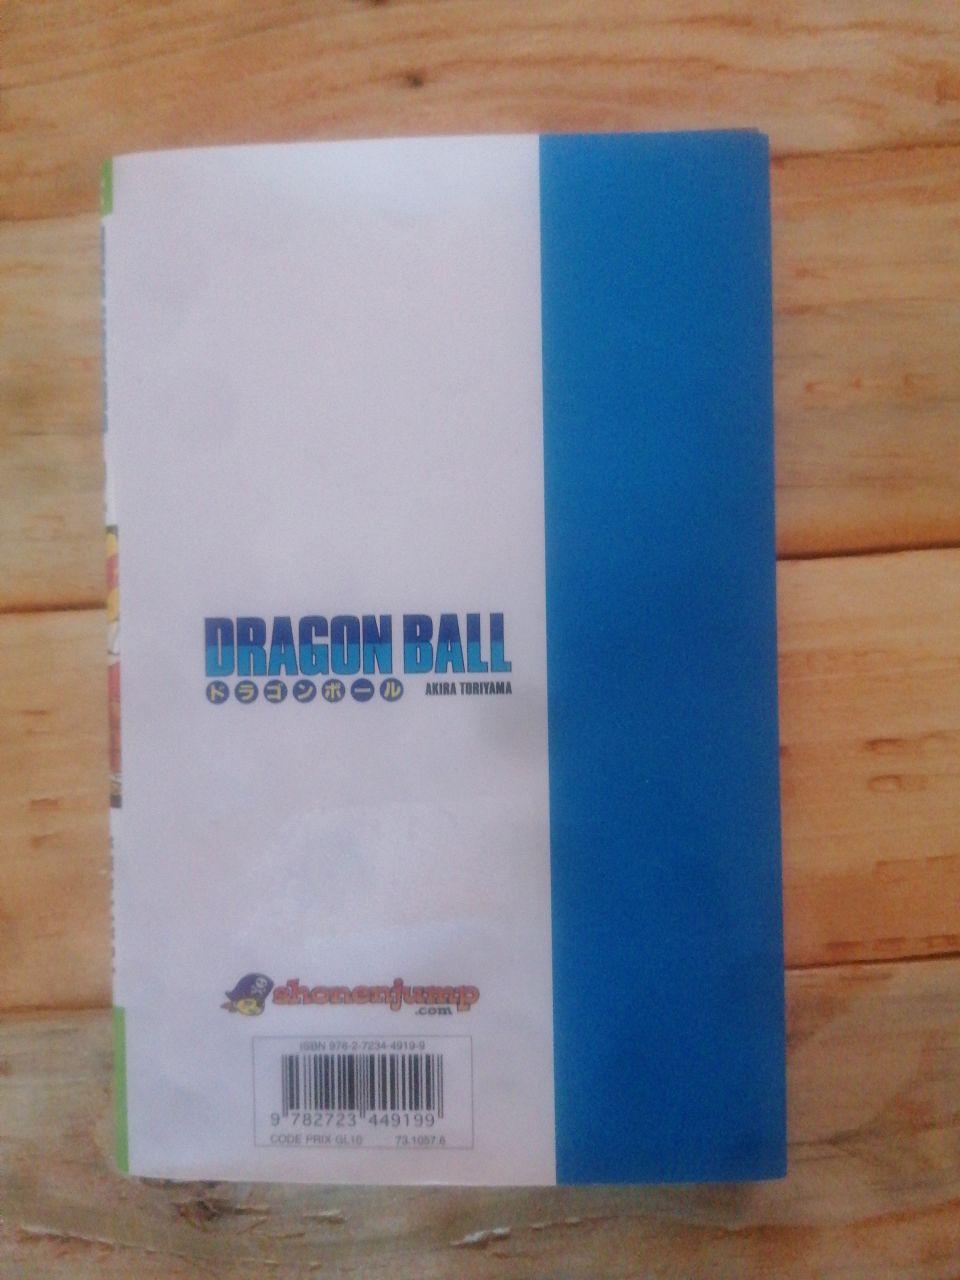 Image article Dragon ball tome 22 édition glénât